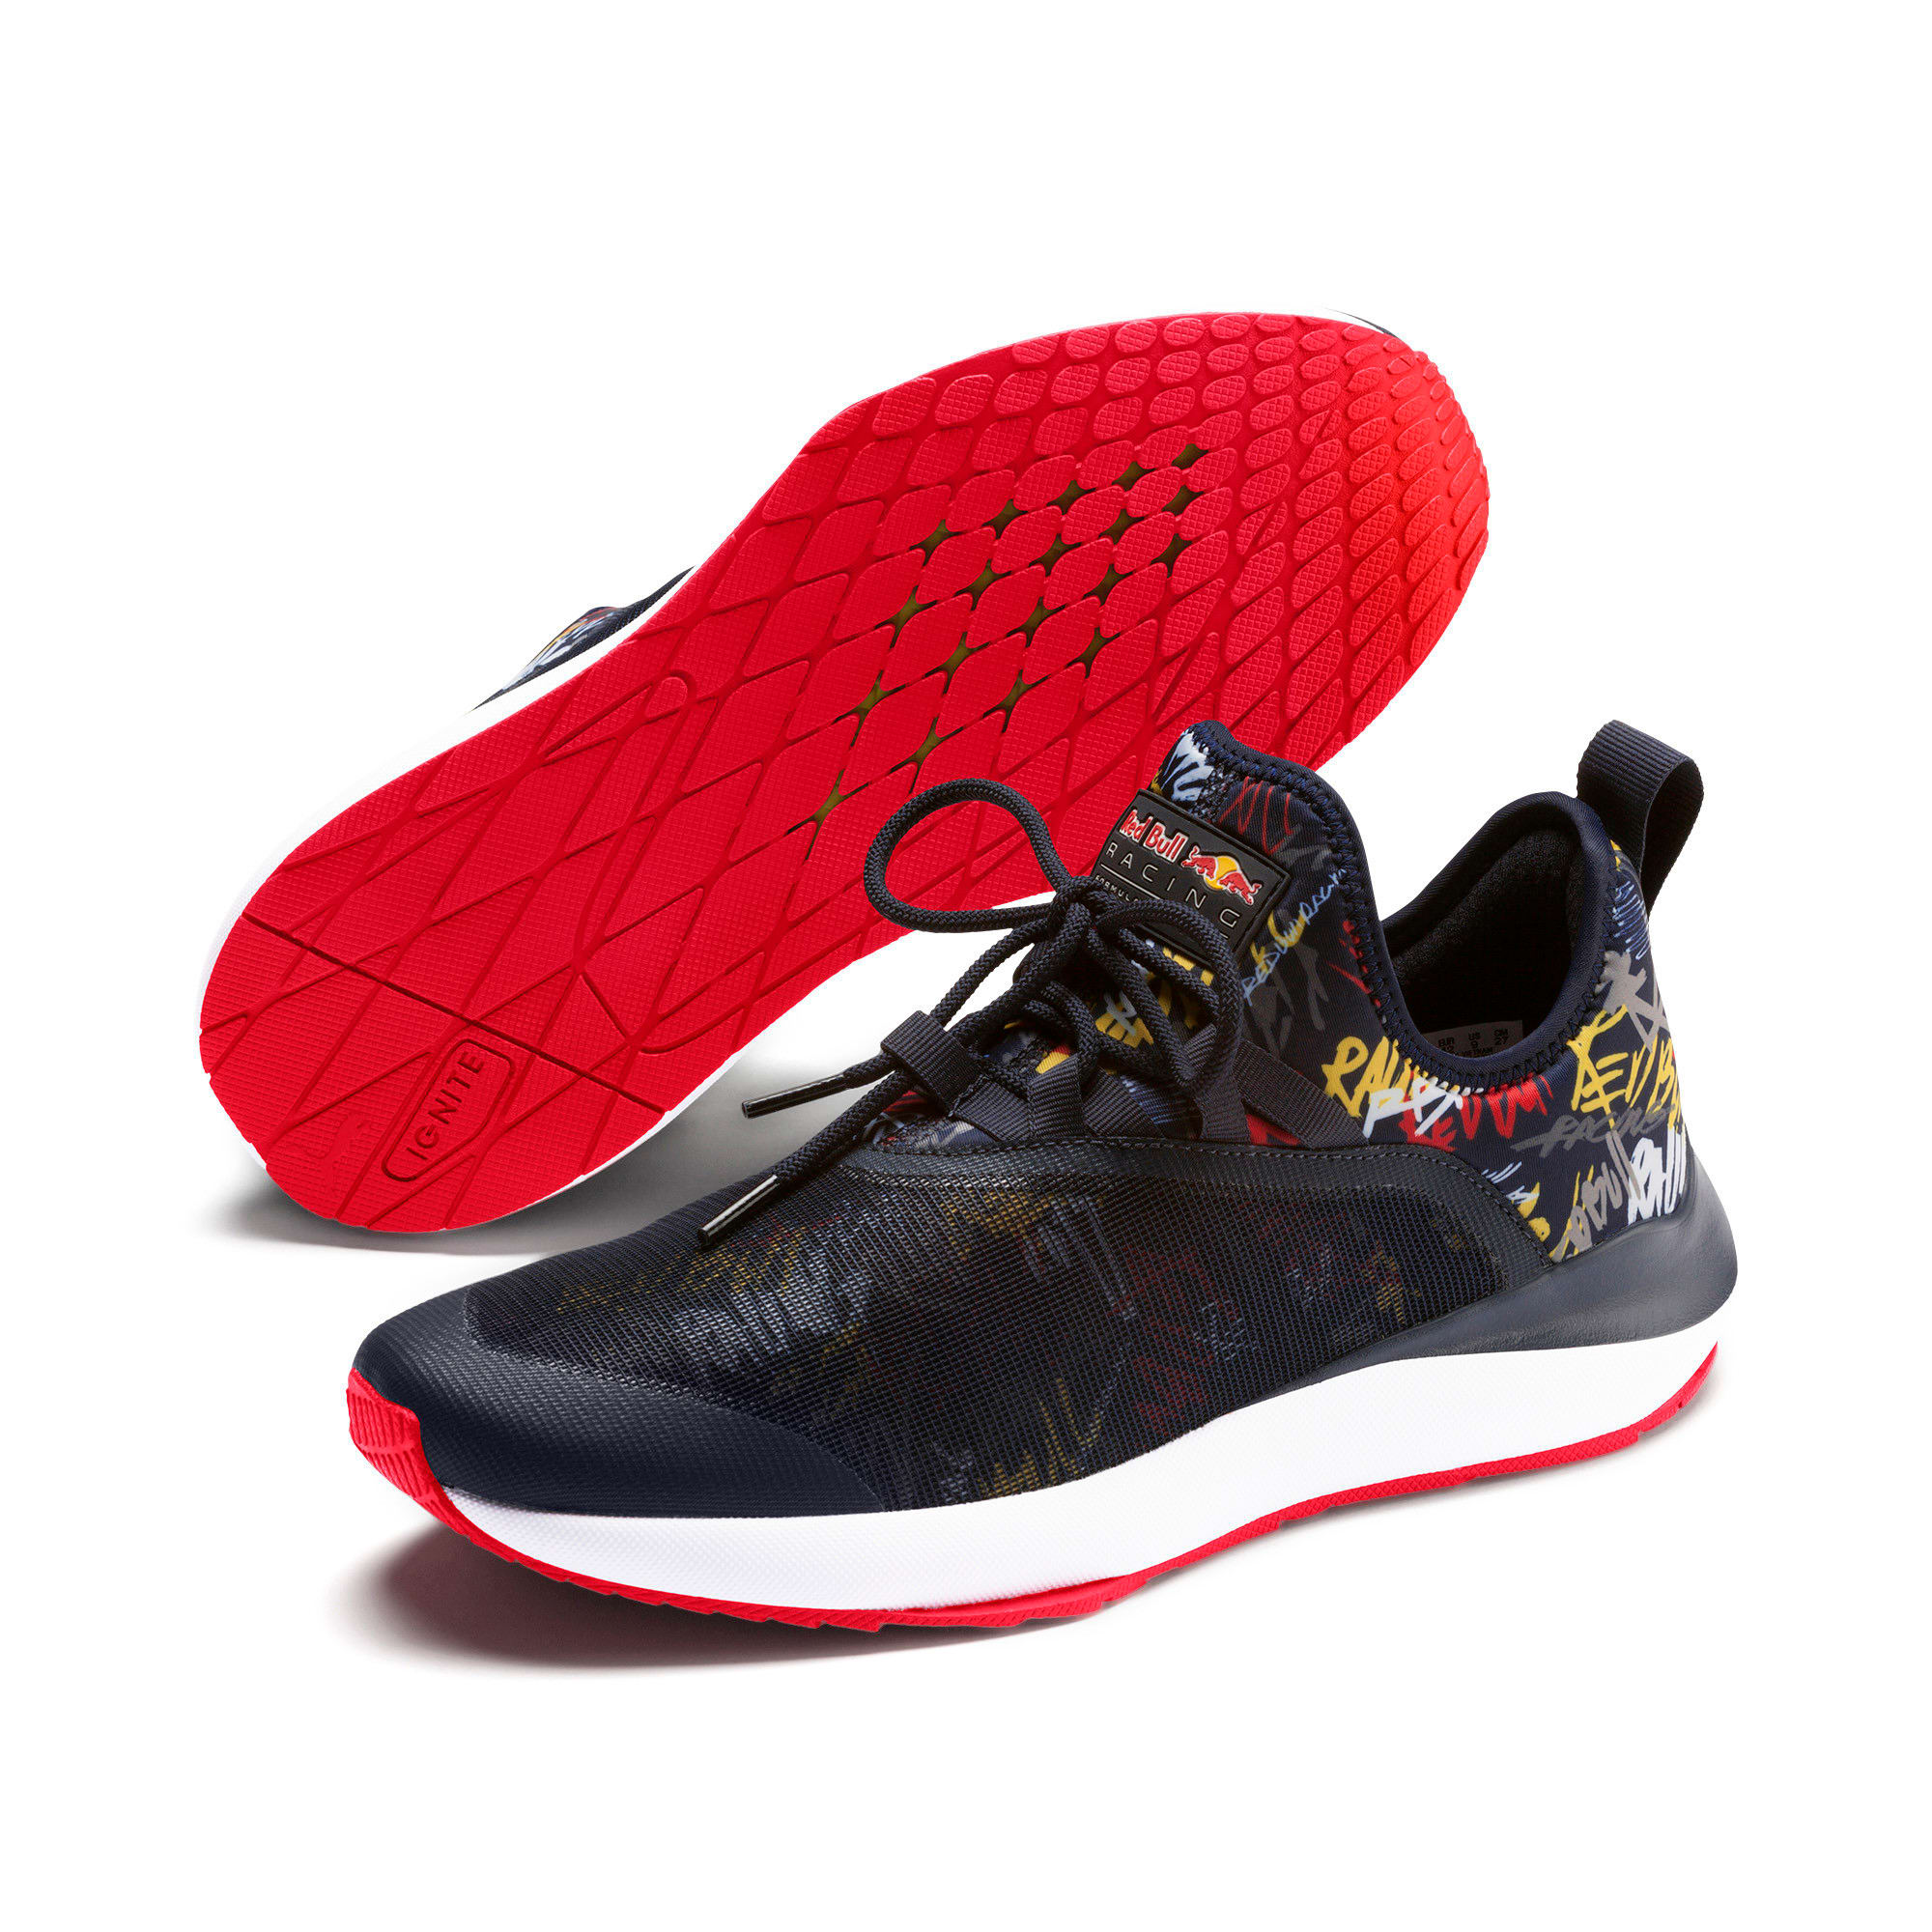 Thumbnail 2 of Red Bull Racing Evo Cat II Graphic Men's Training Shoes, NIGHT SKY-White-Chinese Red, medium